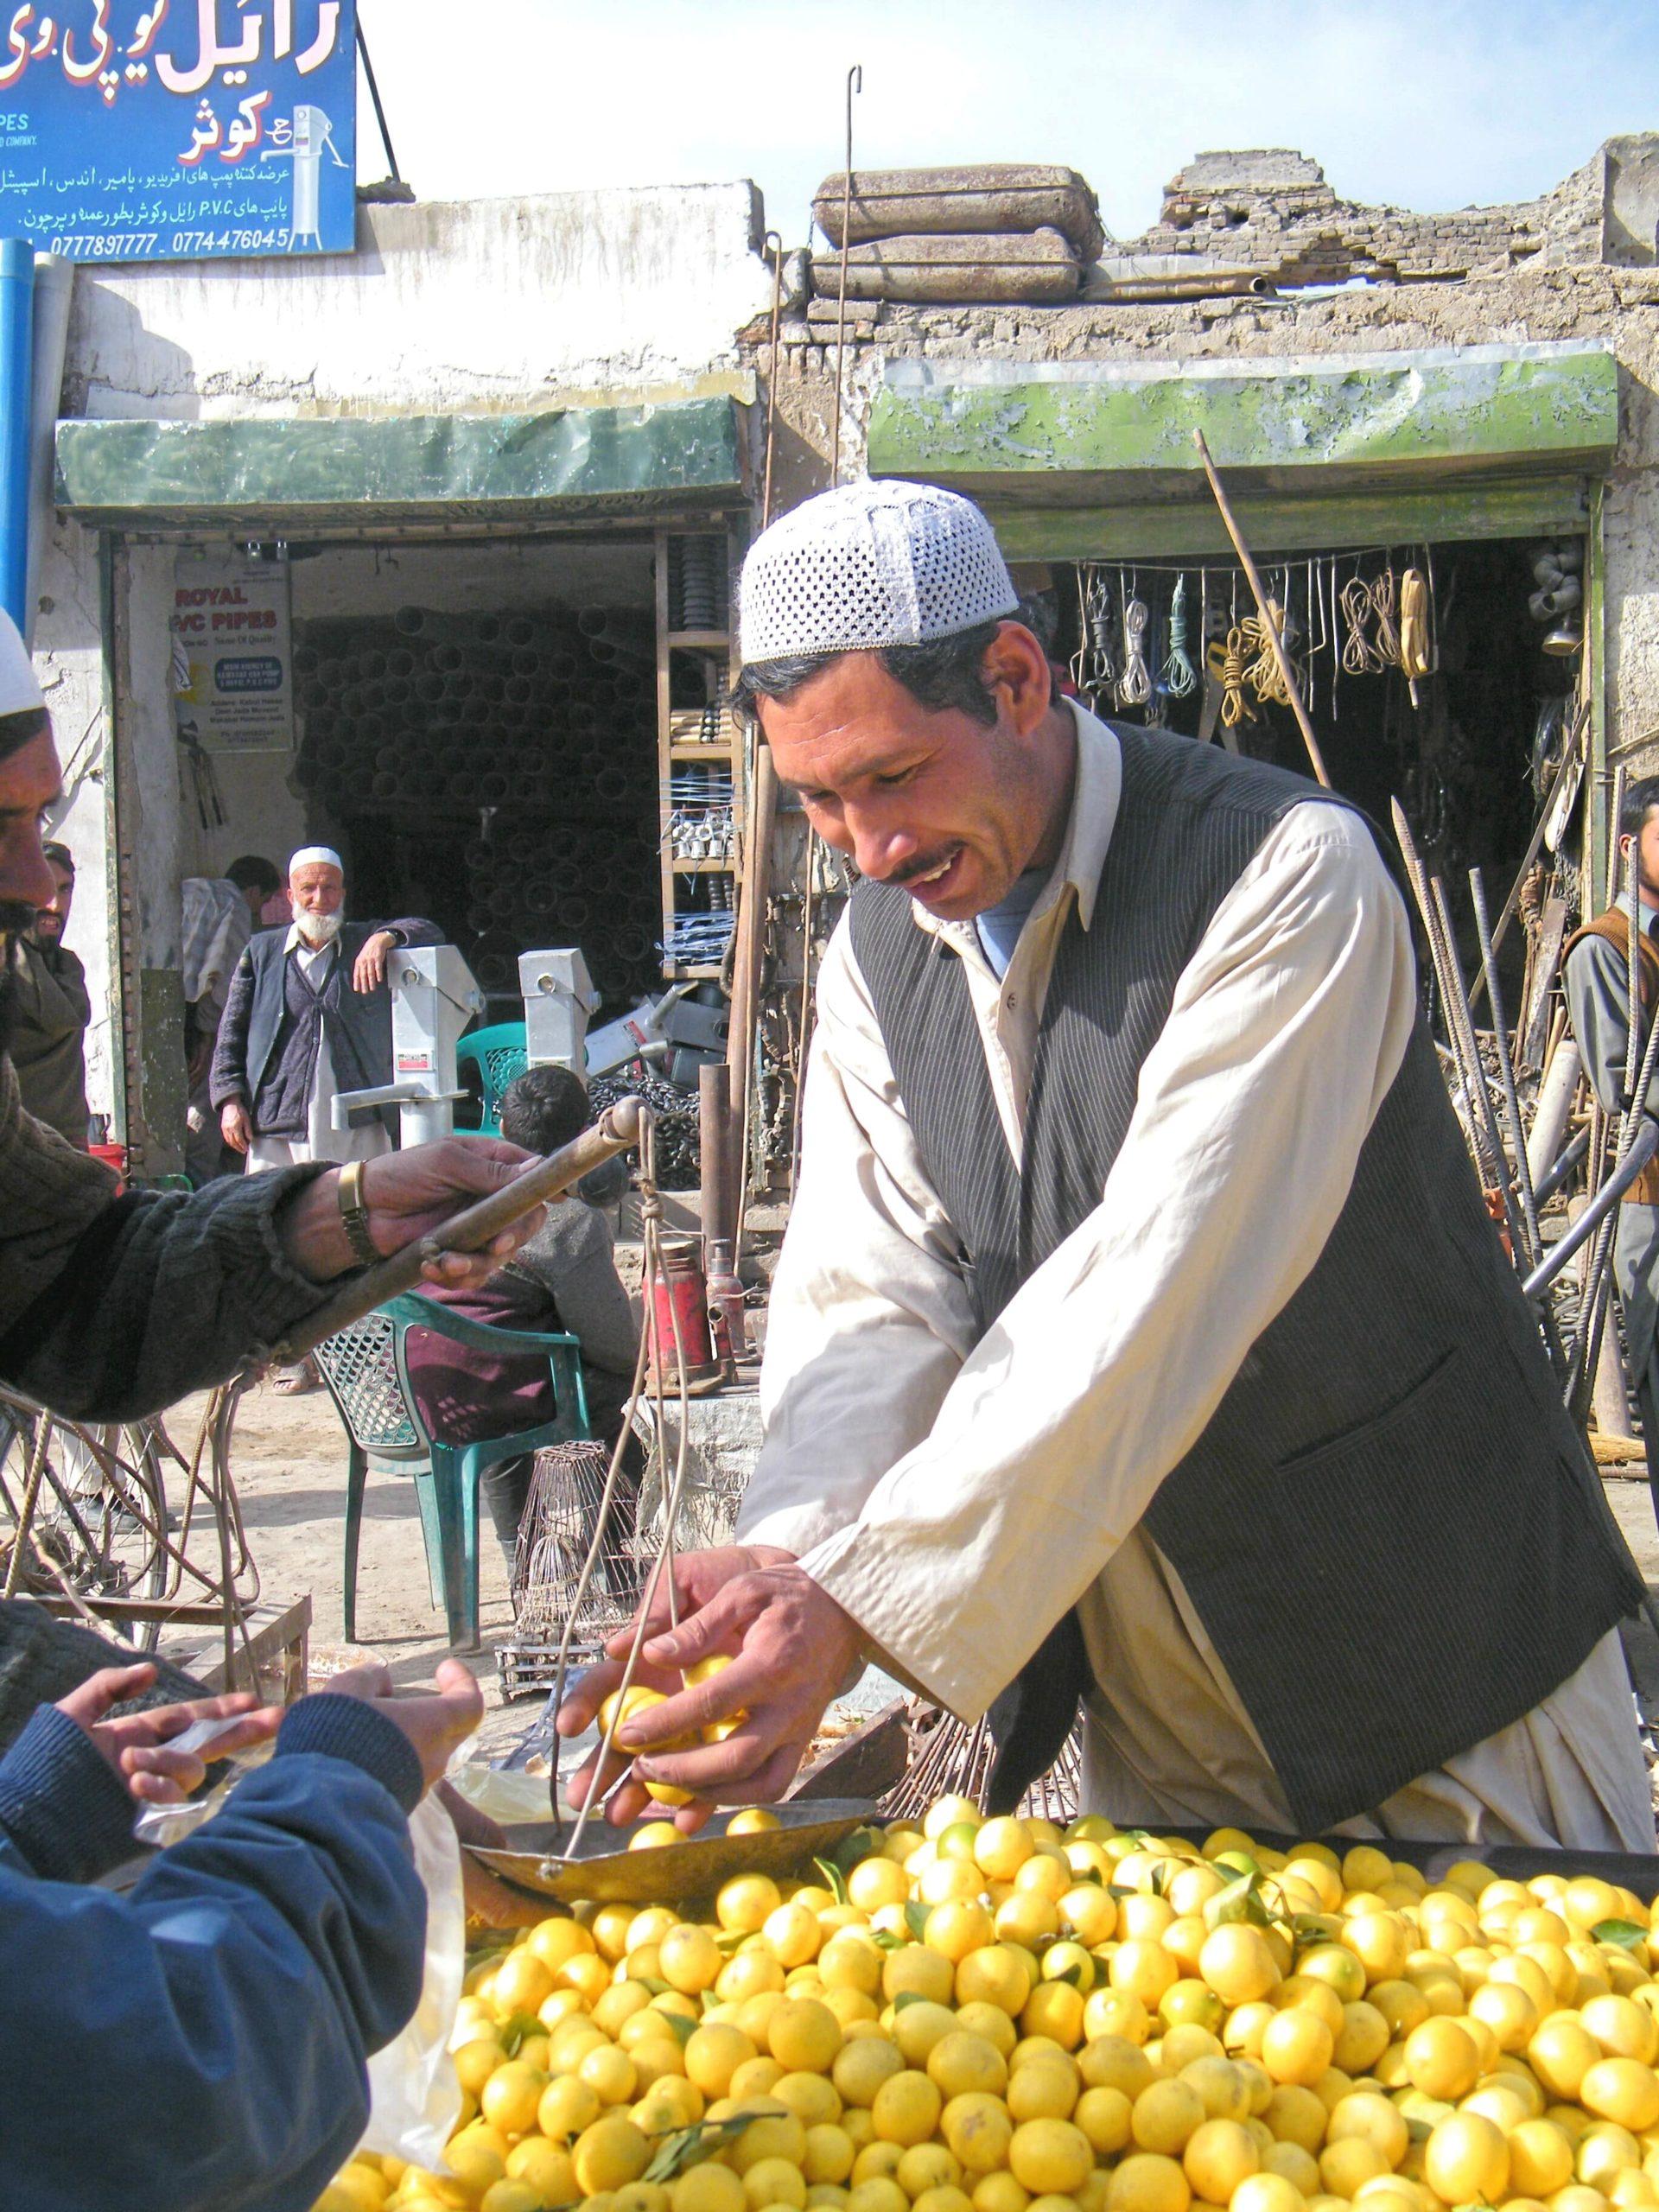 An Afgahni man weighs lemons.